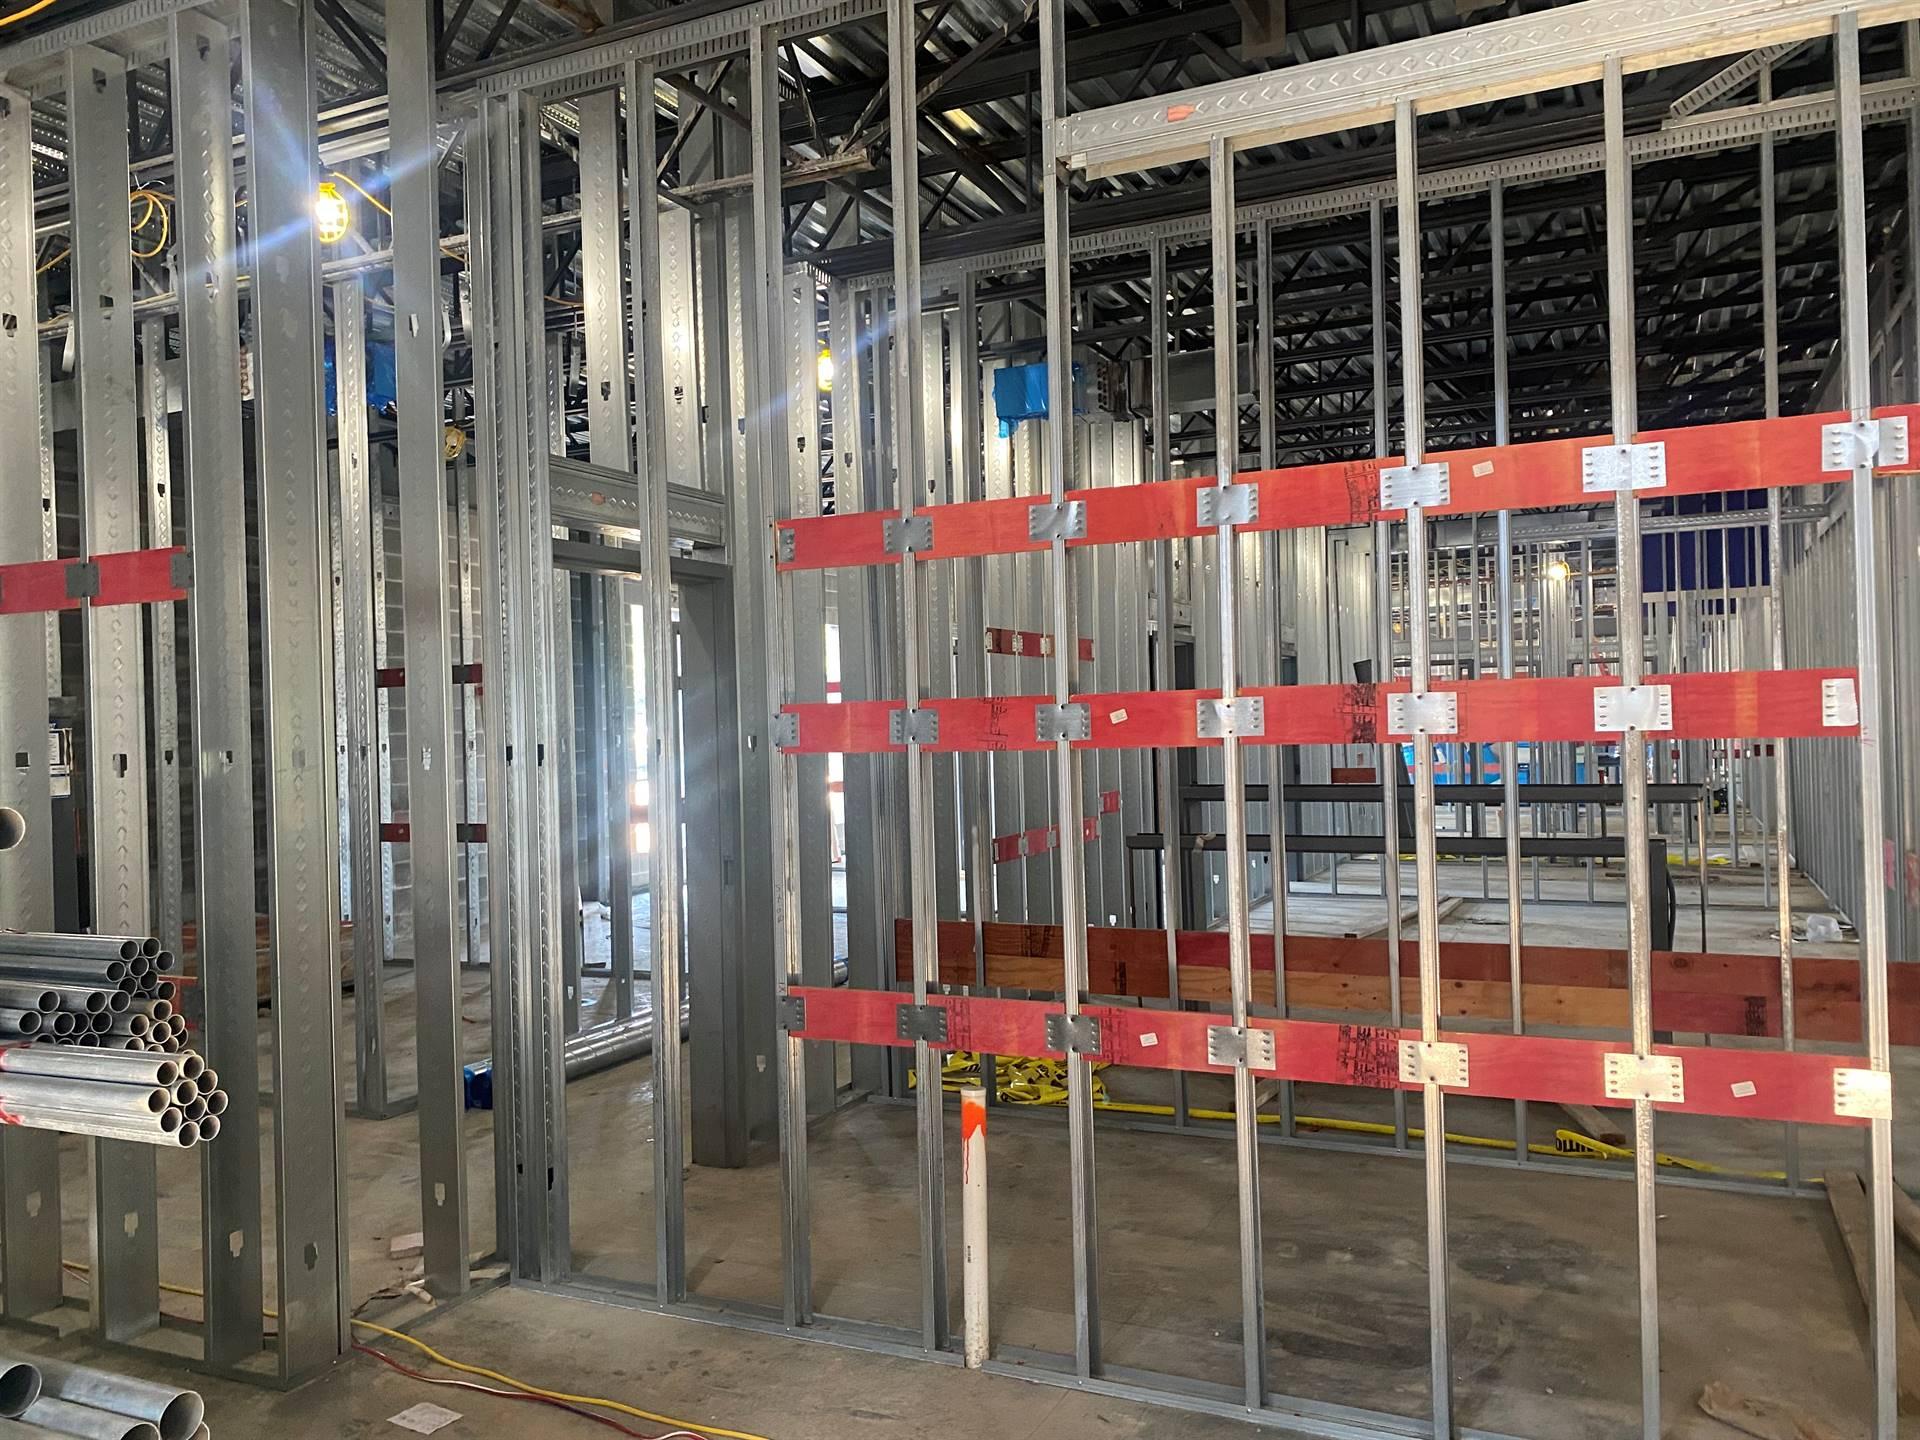 Fairborn Intermediate construction site July 7, 2021